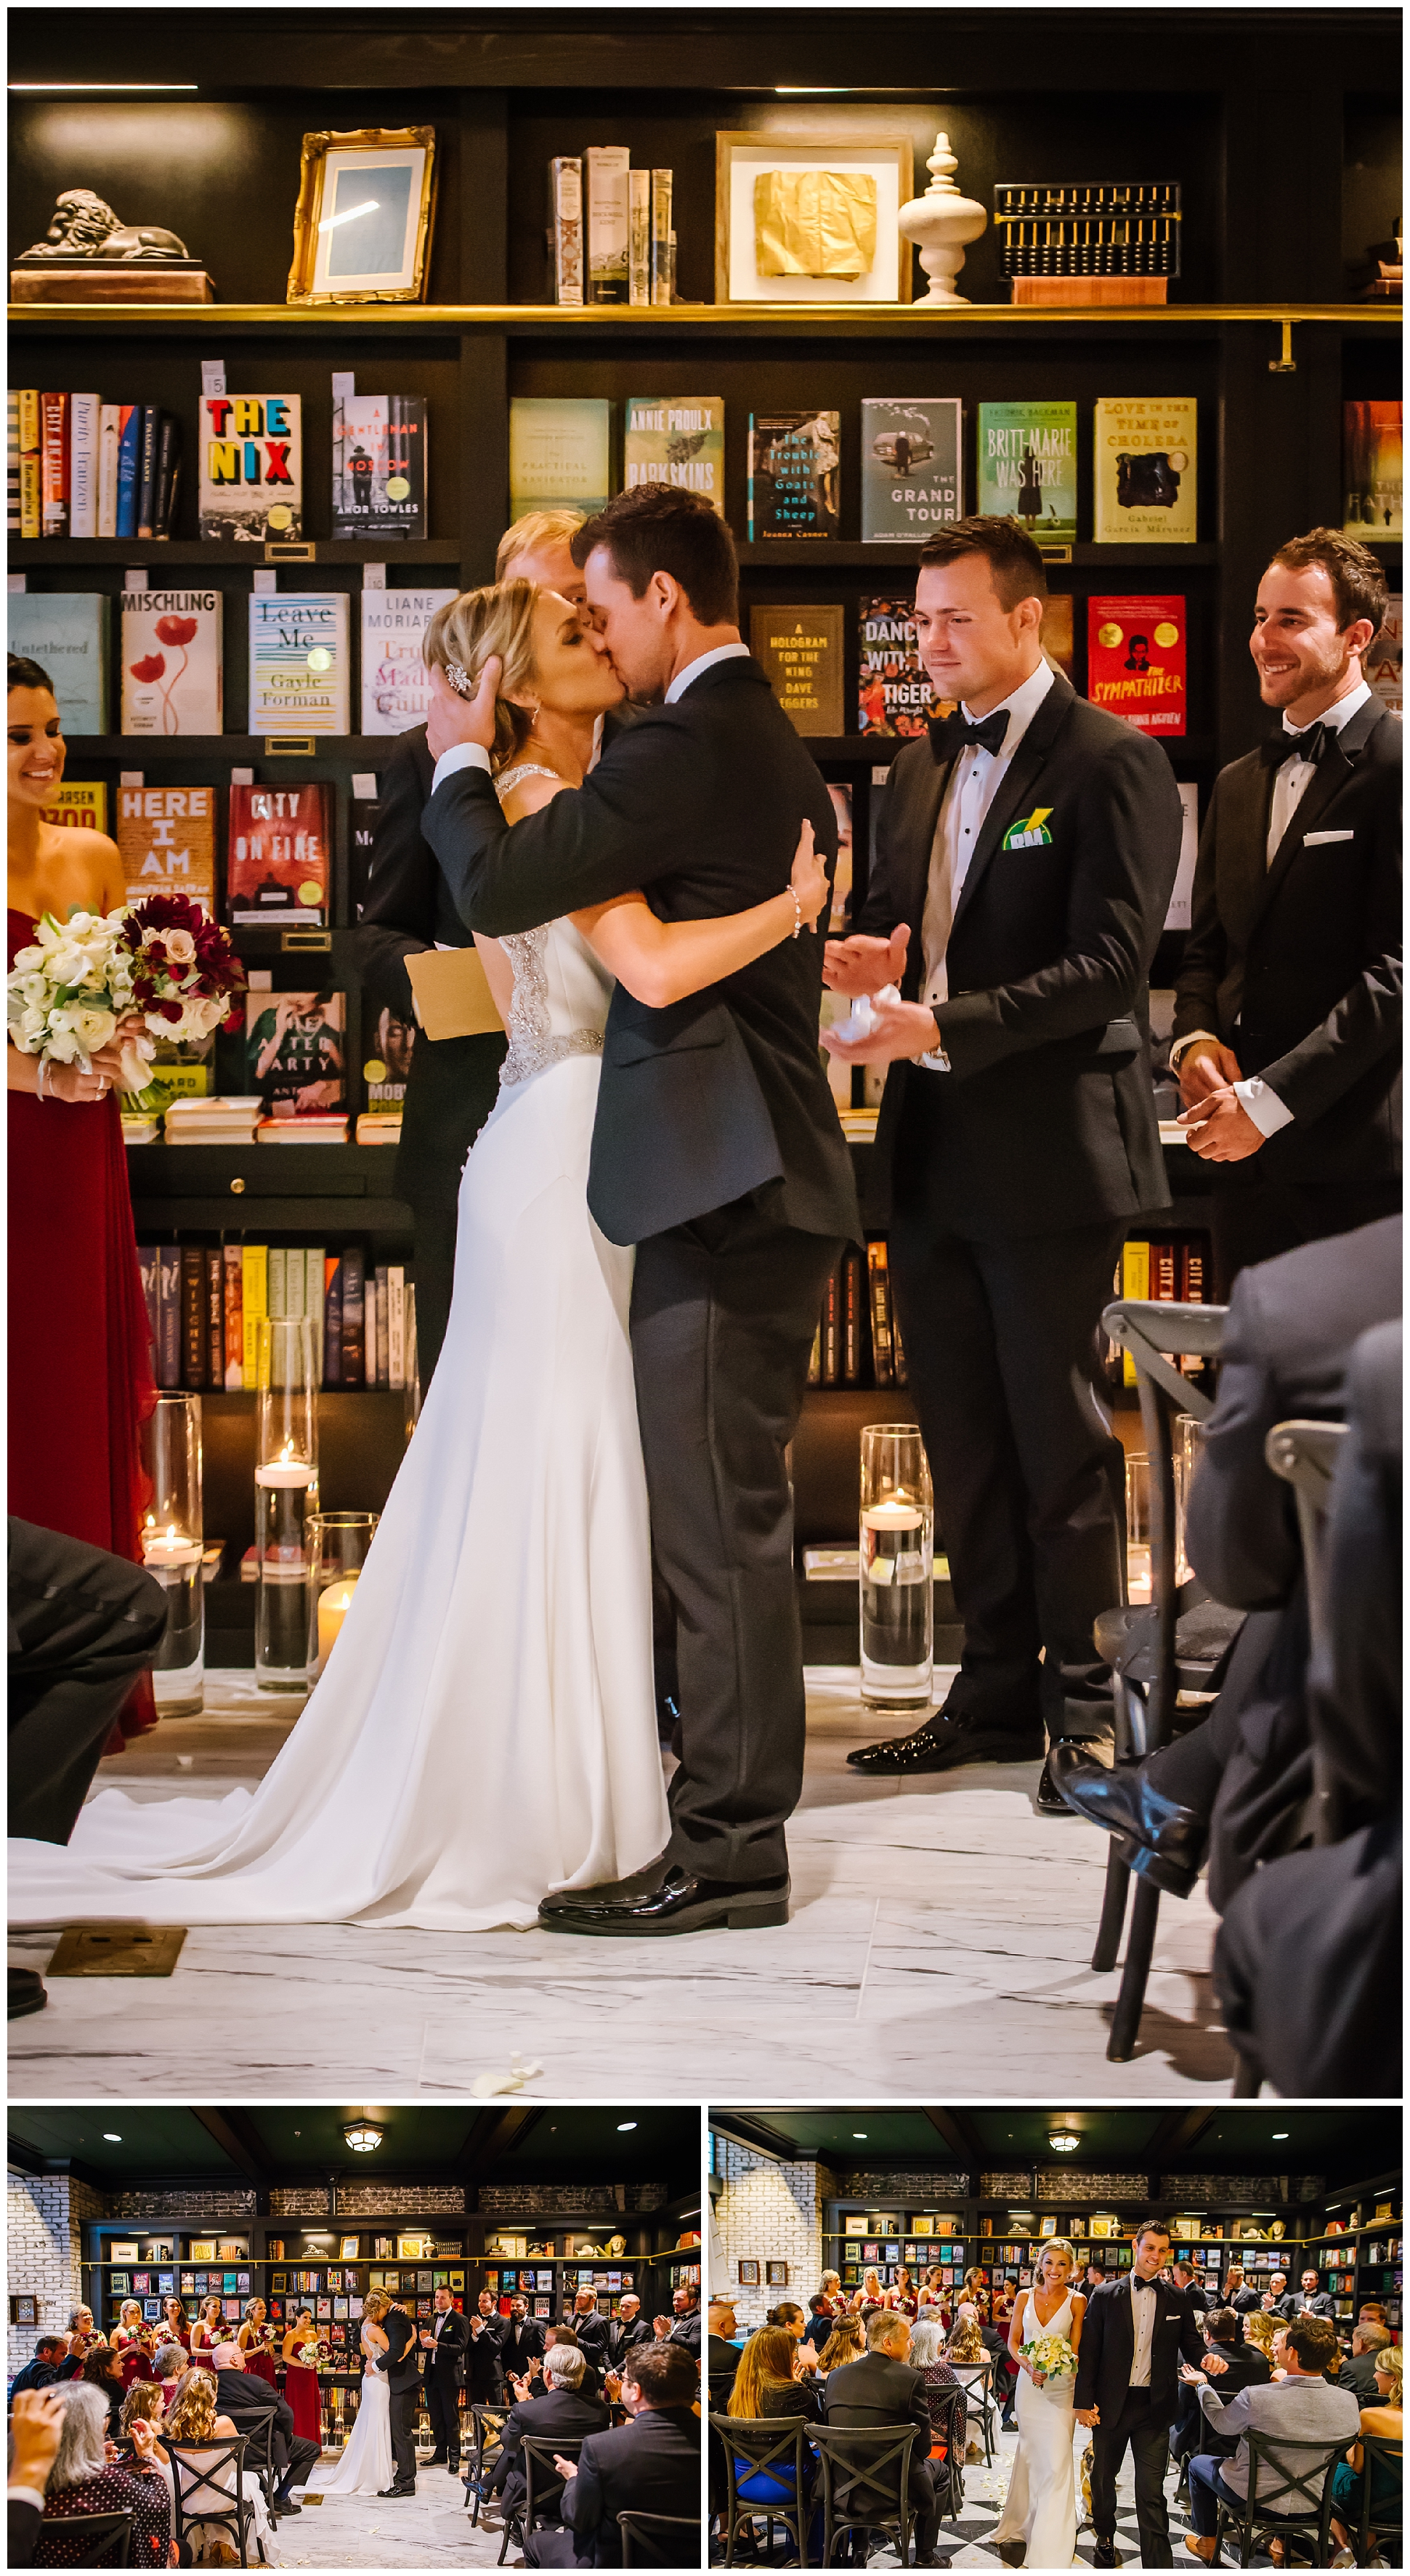 Oxford-exchange-wedding-photogapher-garland-candels-bookstore-burgandy-botanica_0052.jpg